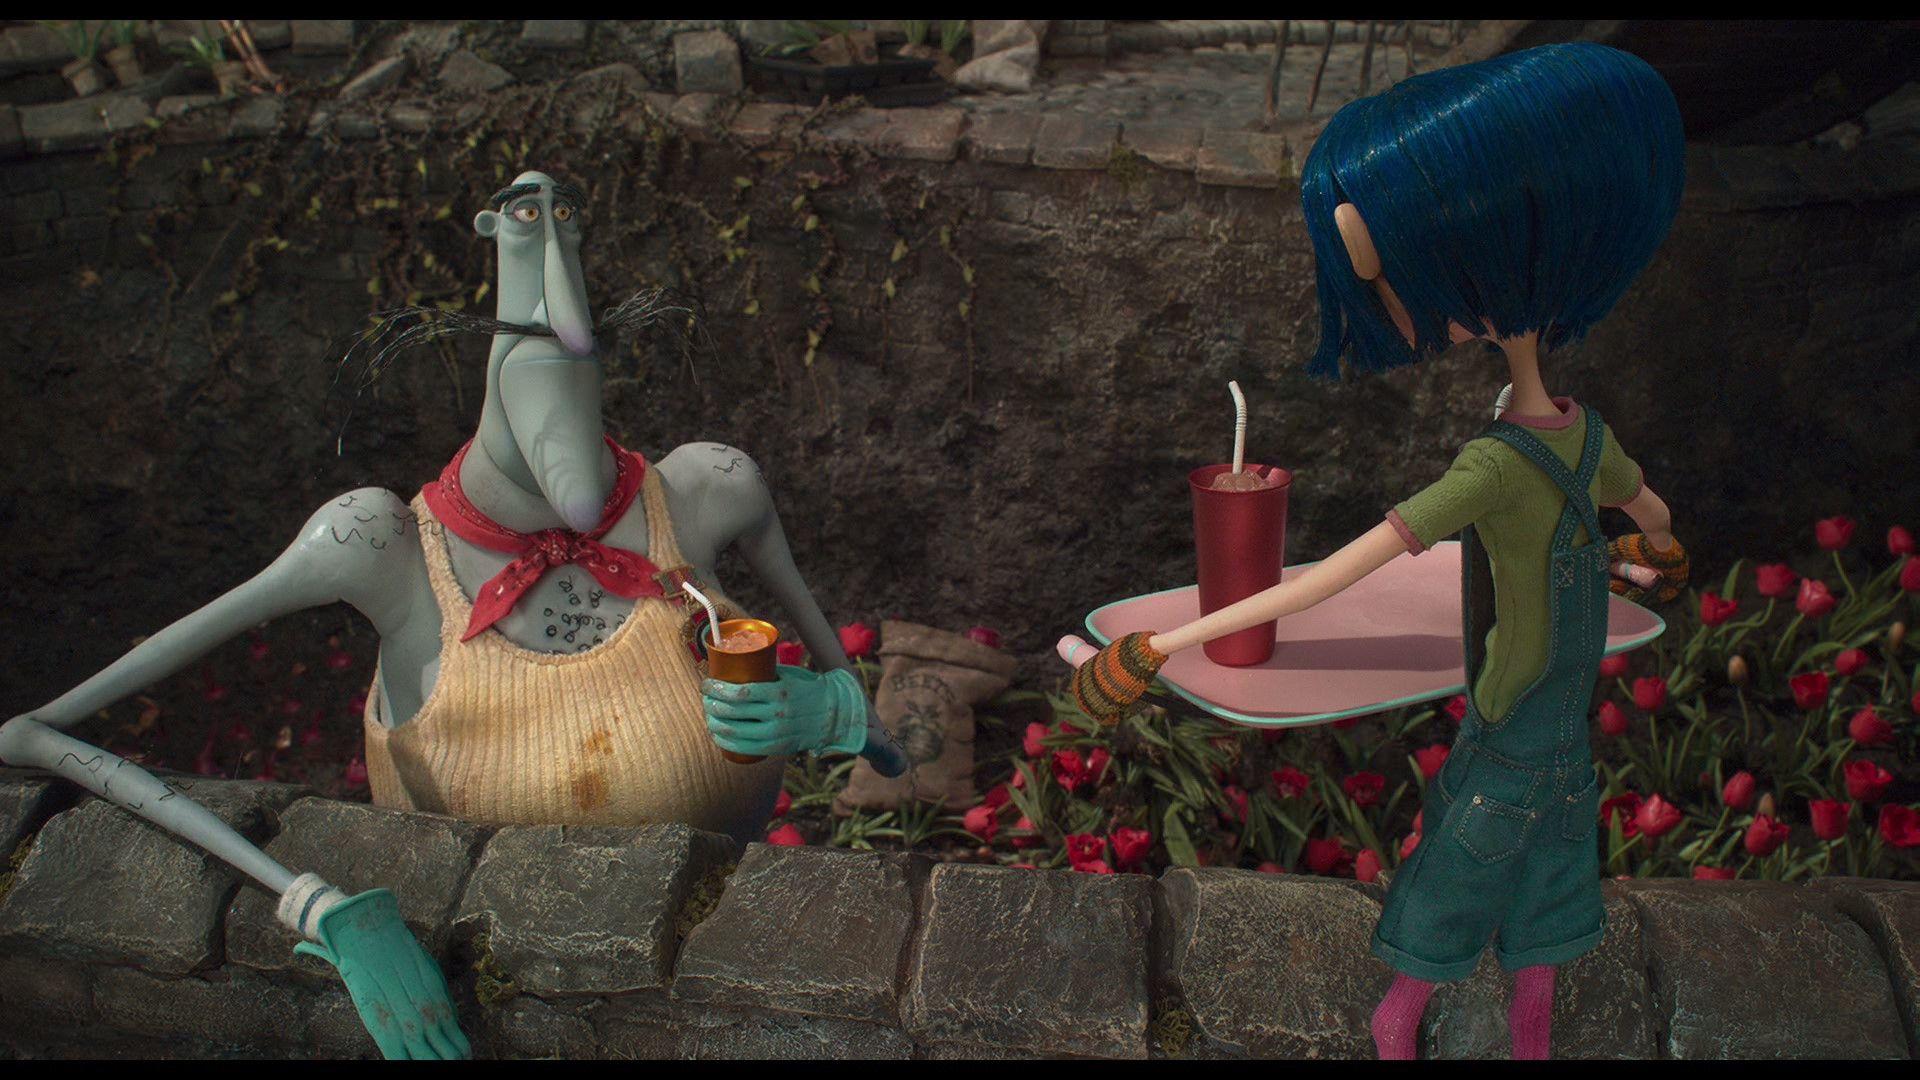 Coraline Blu Ray Teri Hatcher Dakota Fanning Coraline Coraline Jones Coraline Aesthetic